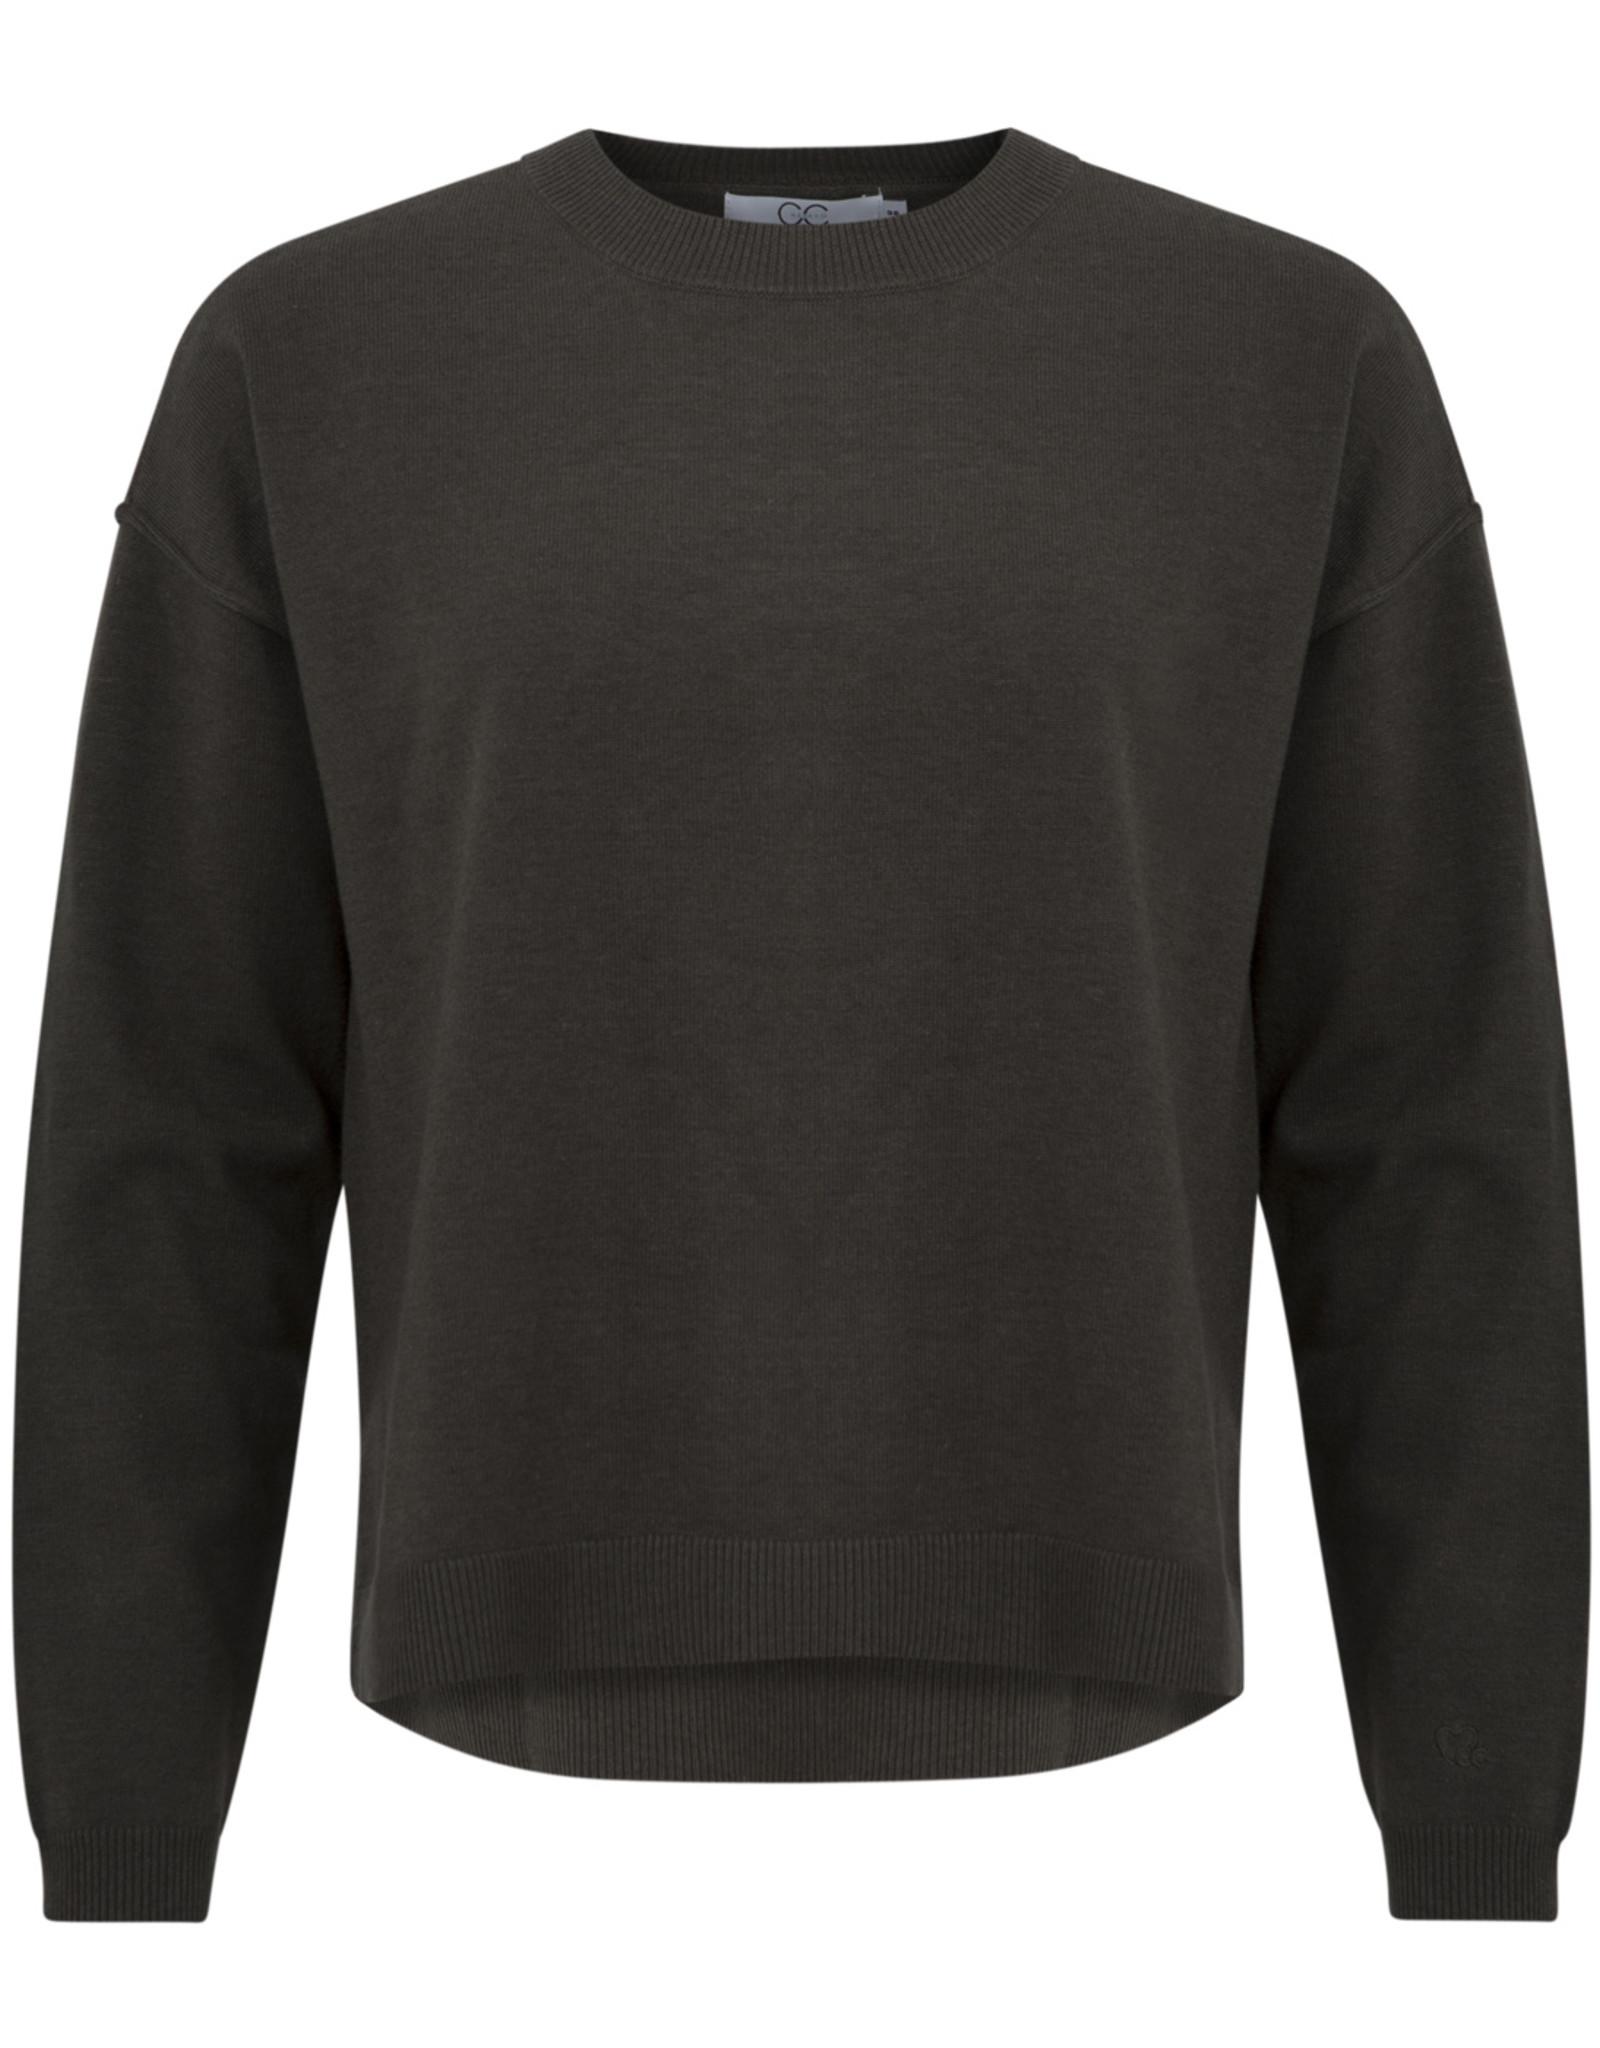 2600-486 Sweater